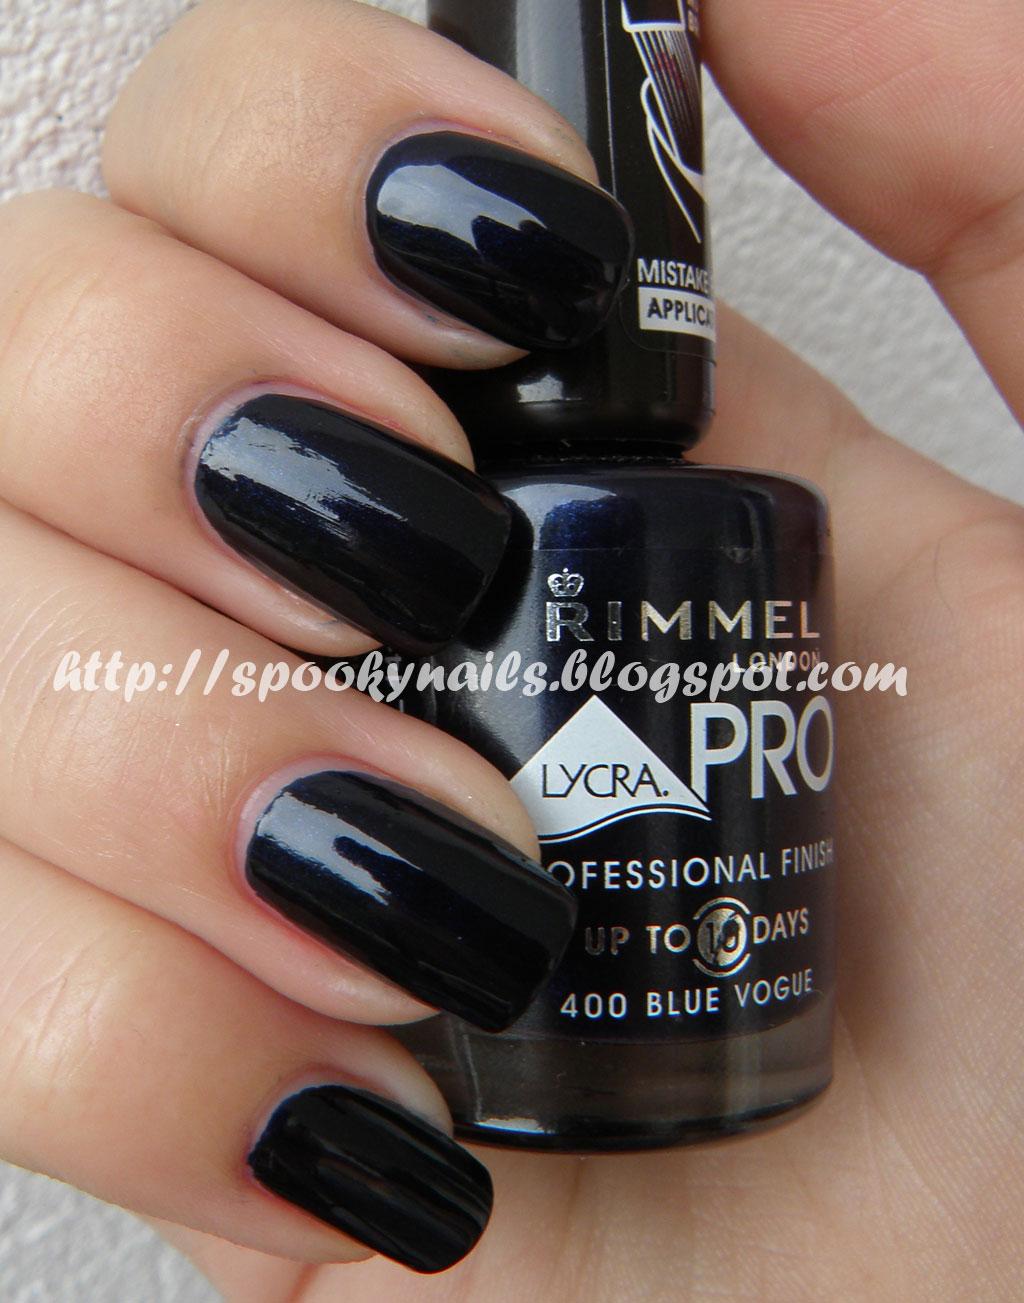 Rimmel Lycra Pro 400 Blue Vogue Spooky Nails